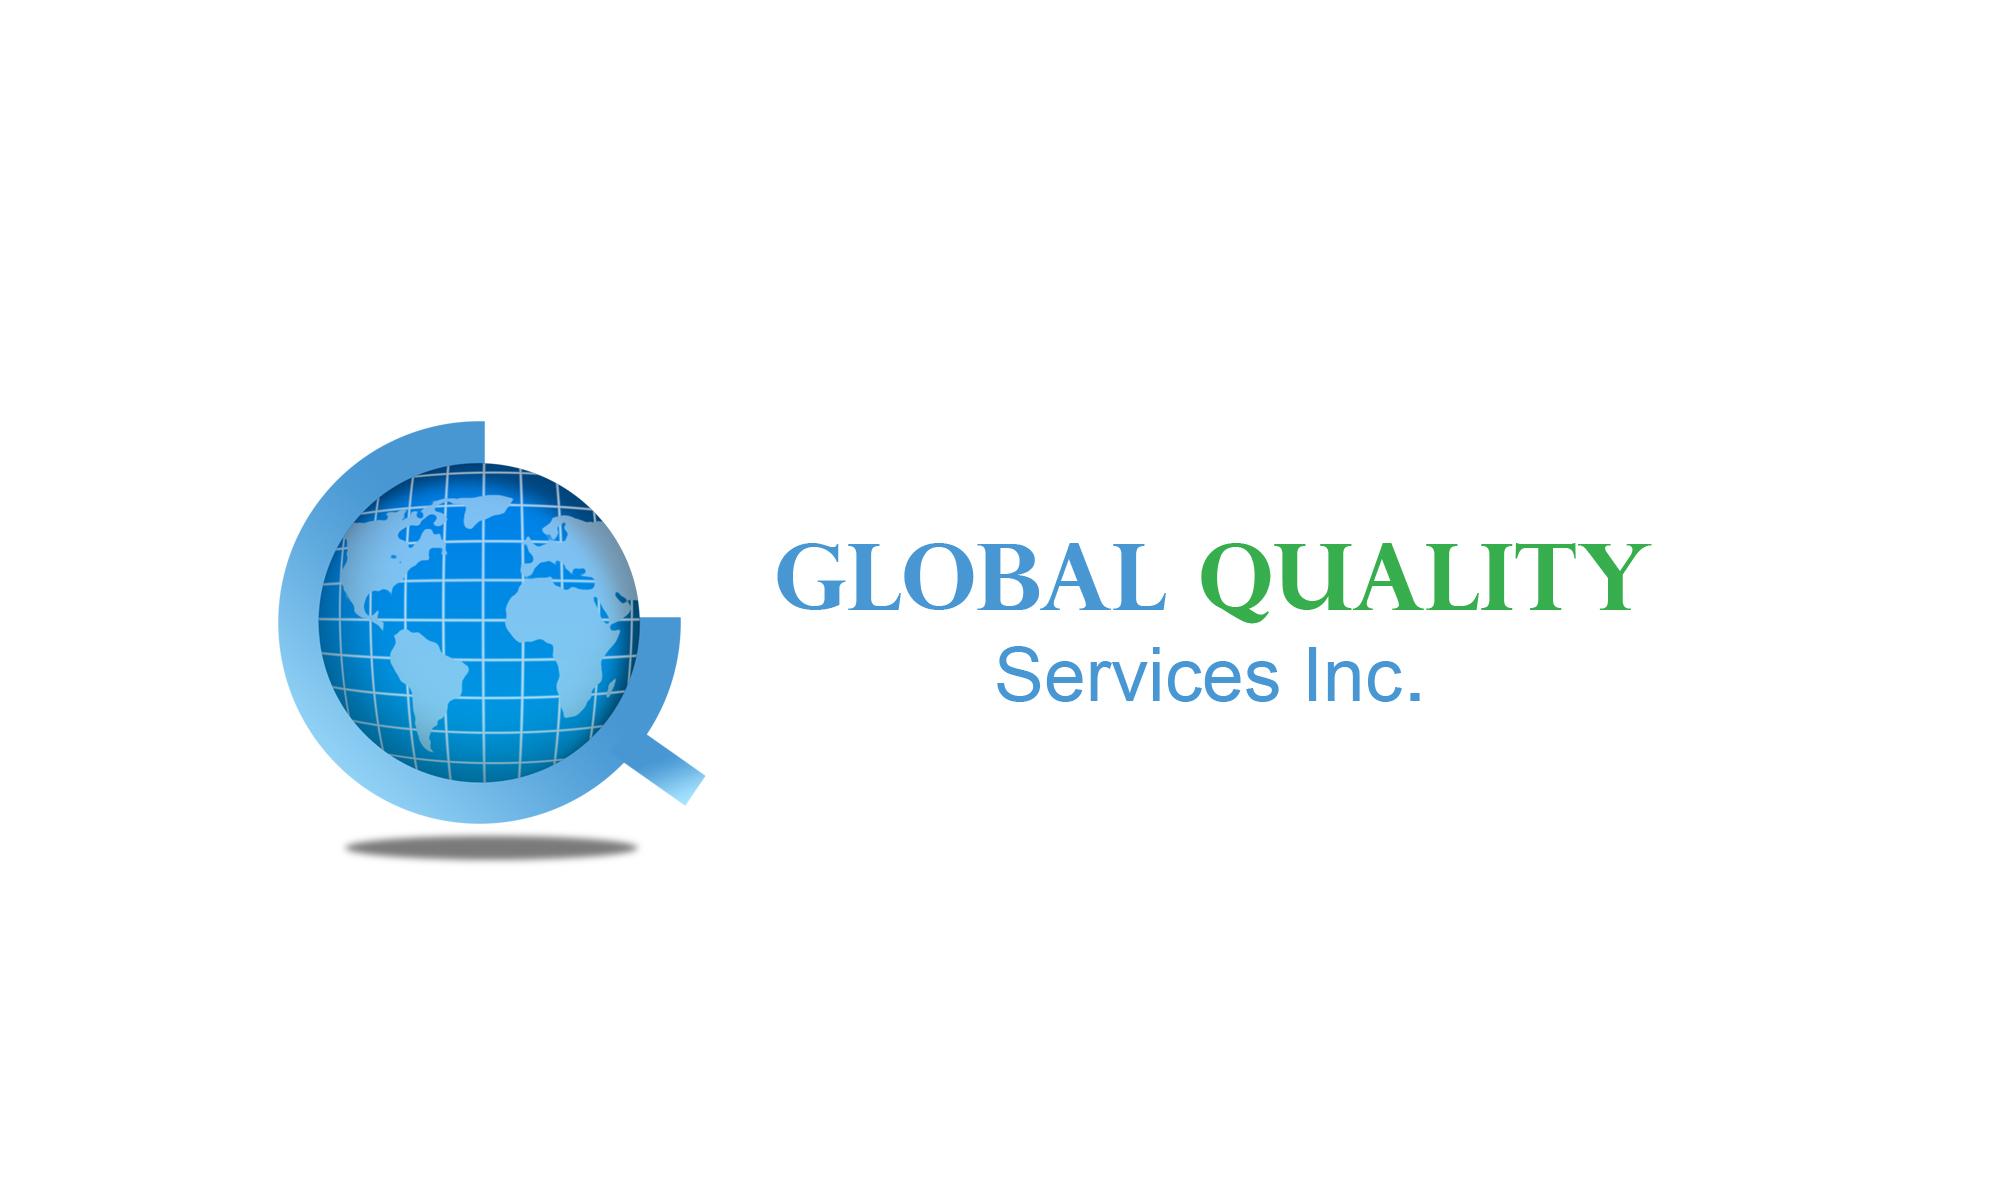 Logo Design by Dante Frits - Entry No. 91 in the Logo Design Contest Inspiring Logo Design for Global Quality Services Inc..